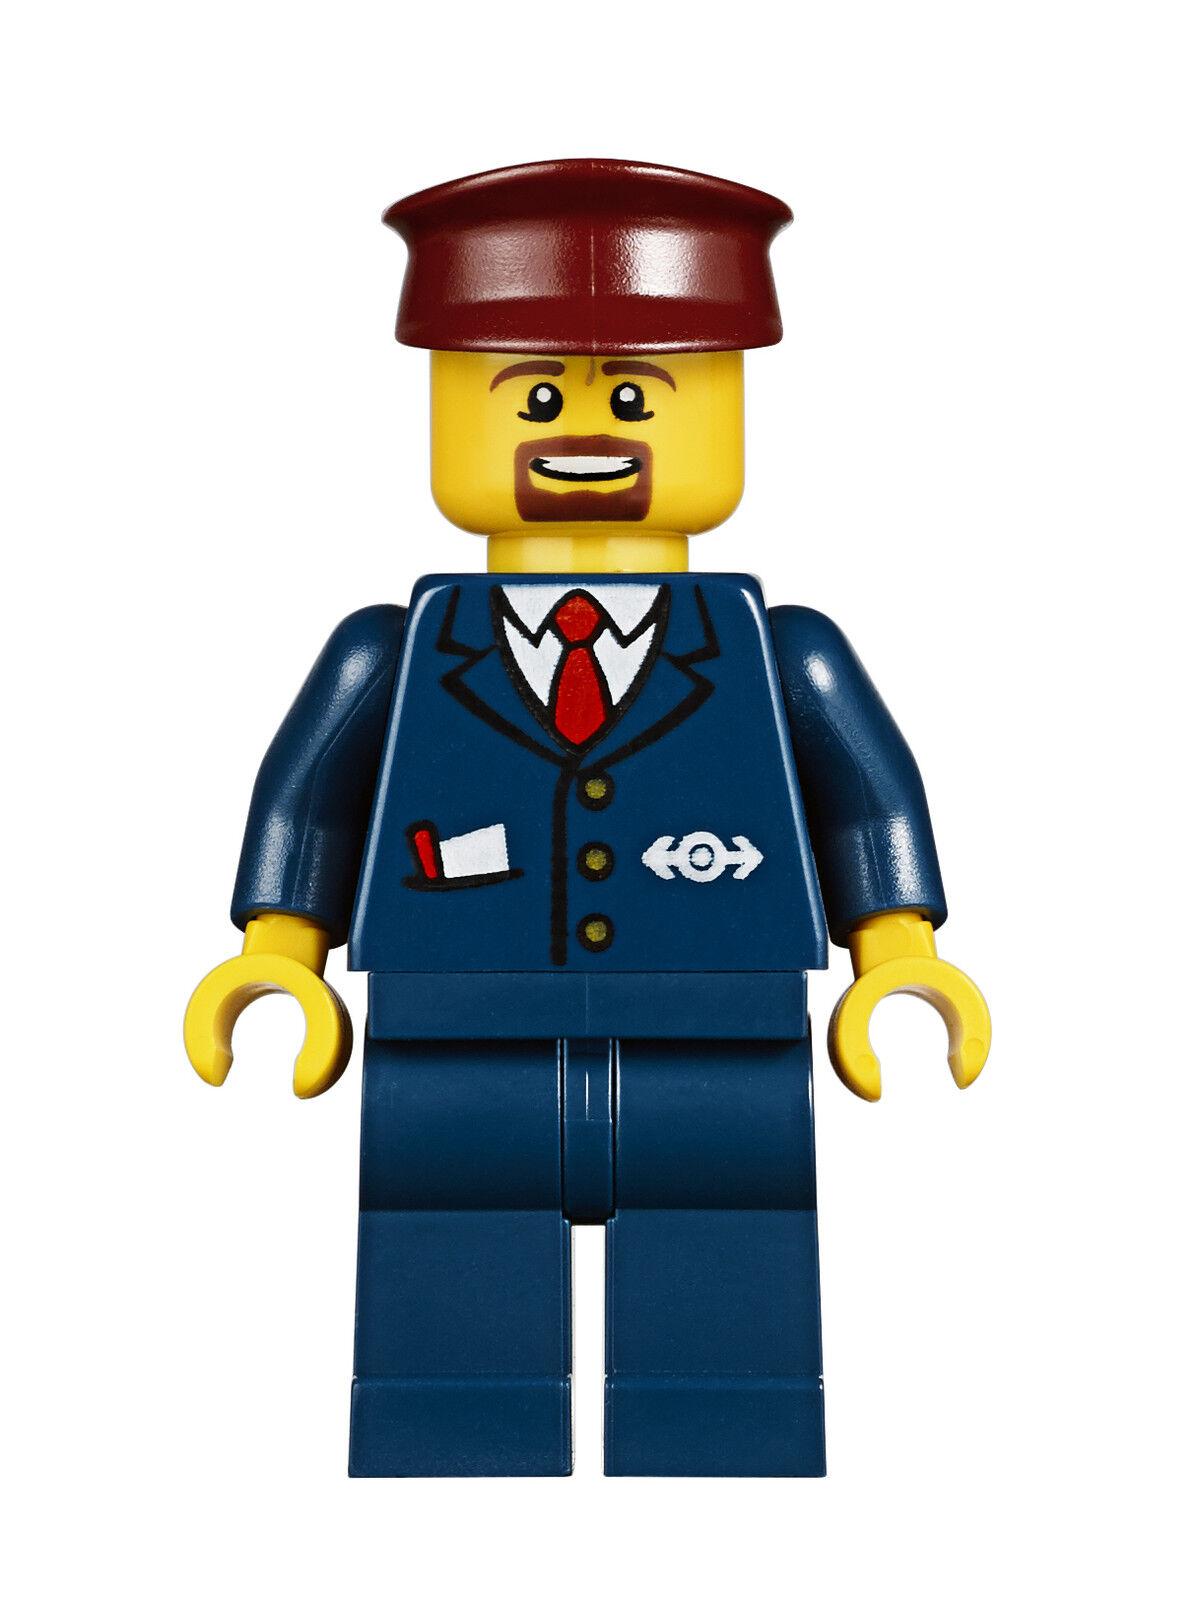 LEGO® City City City 60051 Hochgeschwindigkeitszug NEU OVP  High-speed Passenger Train NEW 126078